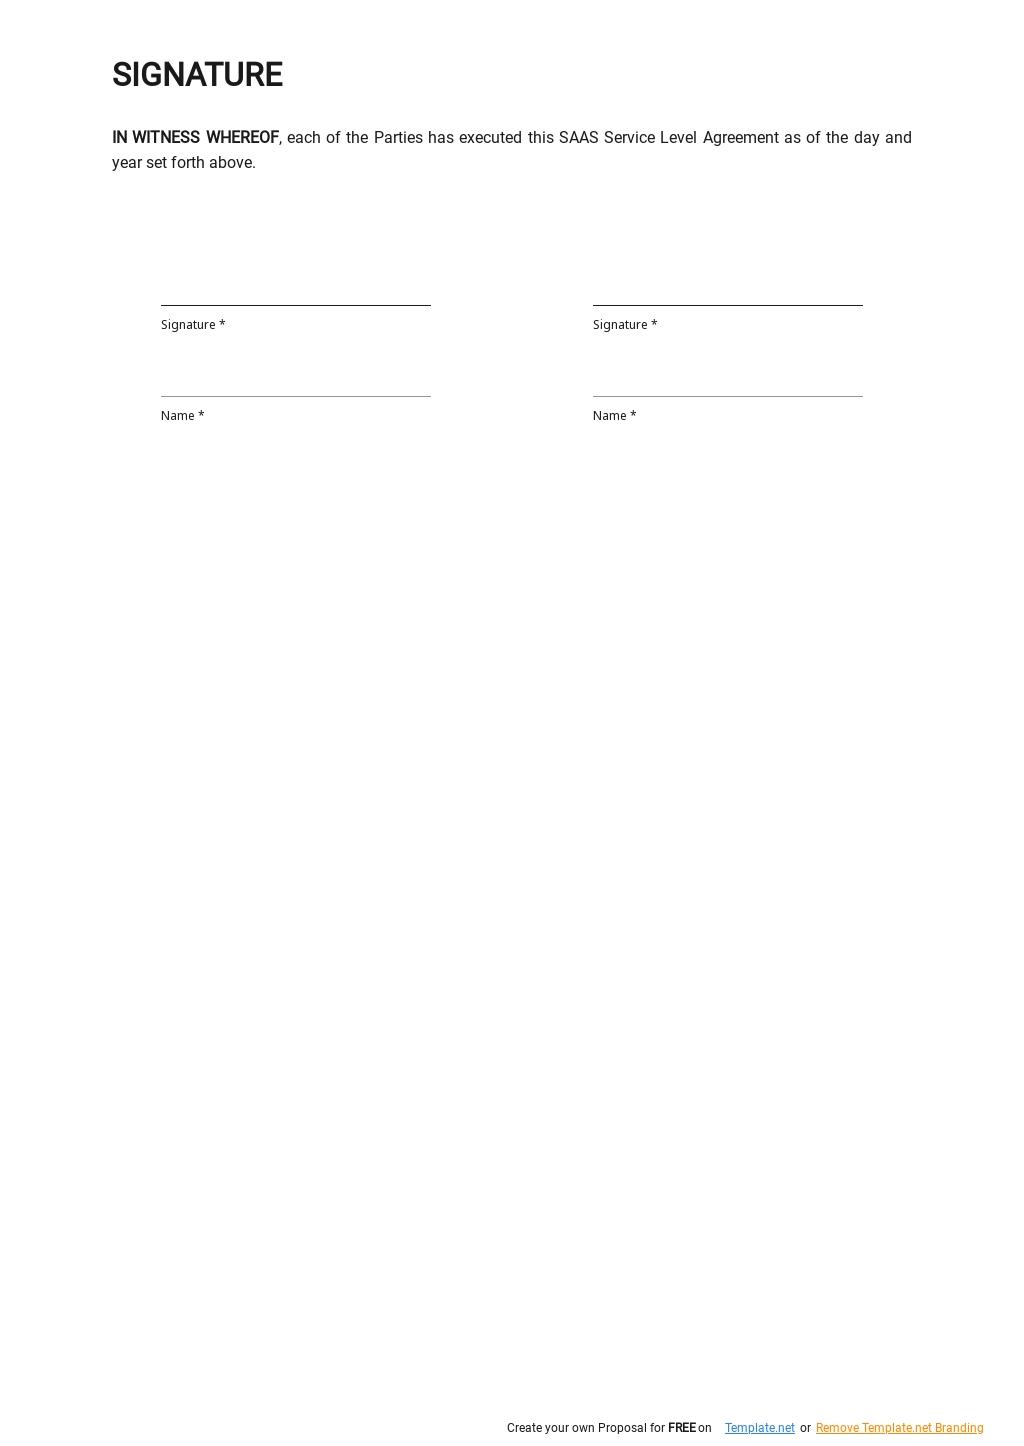 SAAS Service Level Agreement Template 2.jpe